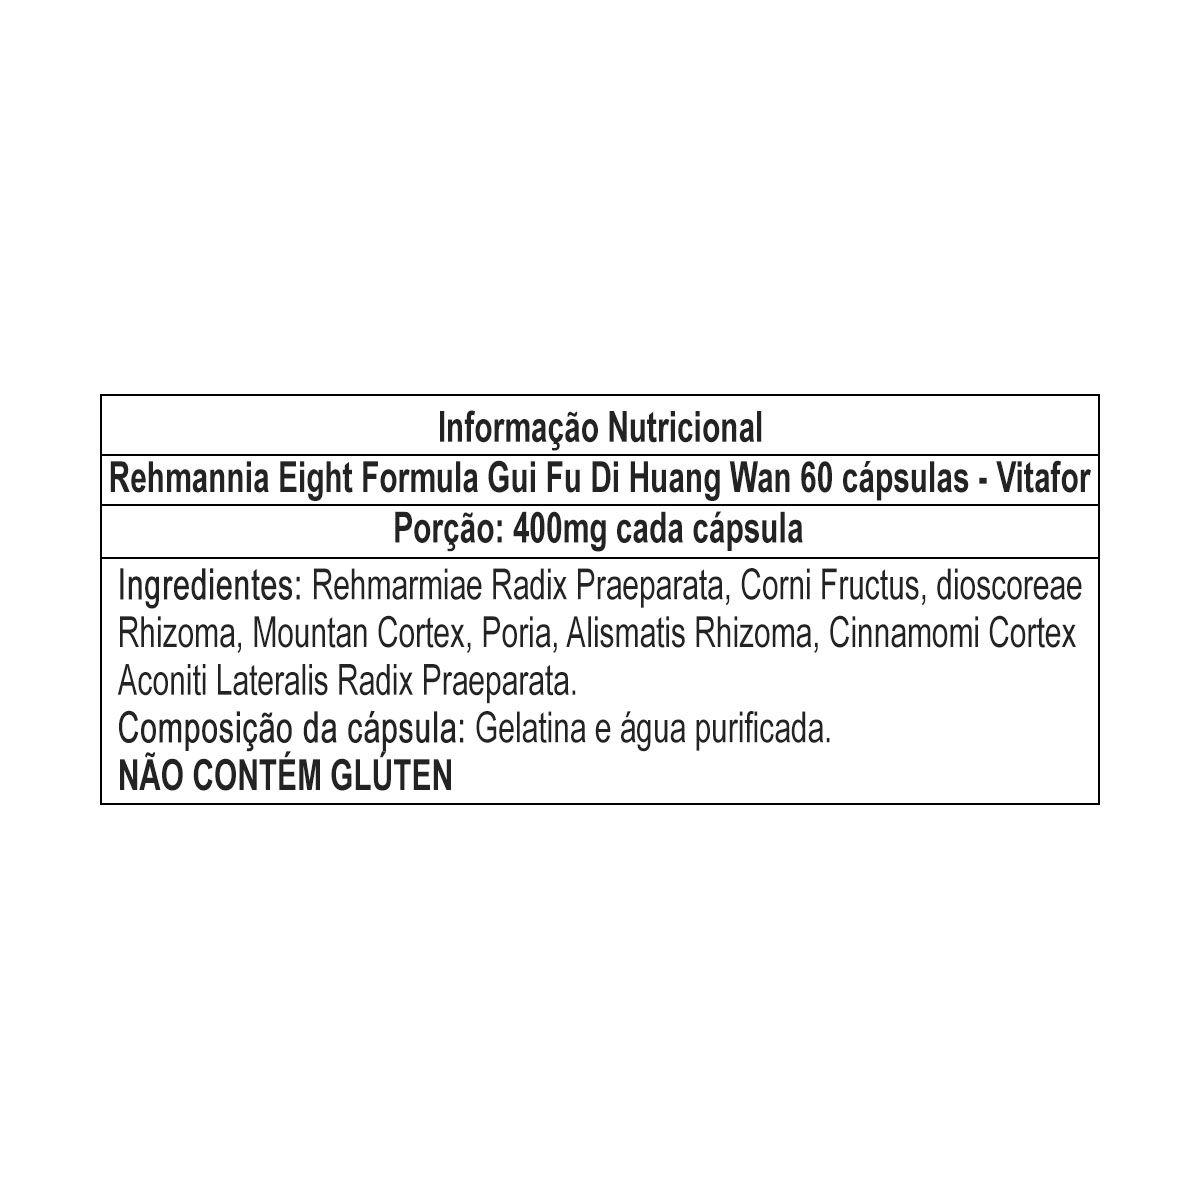 Rehmannia Eight Formula Gui Fu Di Huang Wan 60 cápsulas - Vitafor